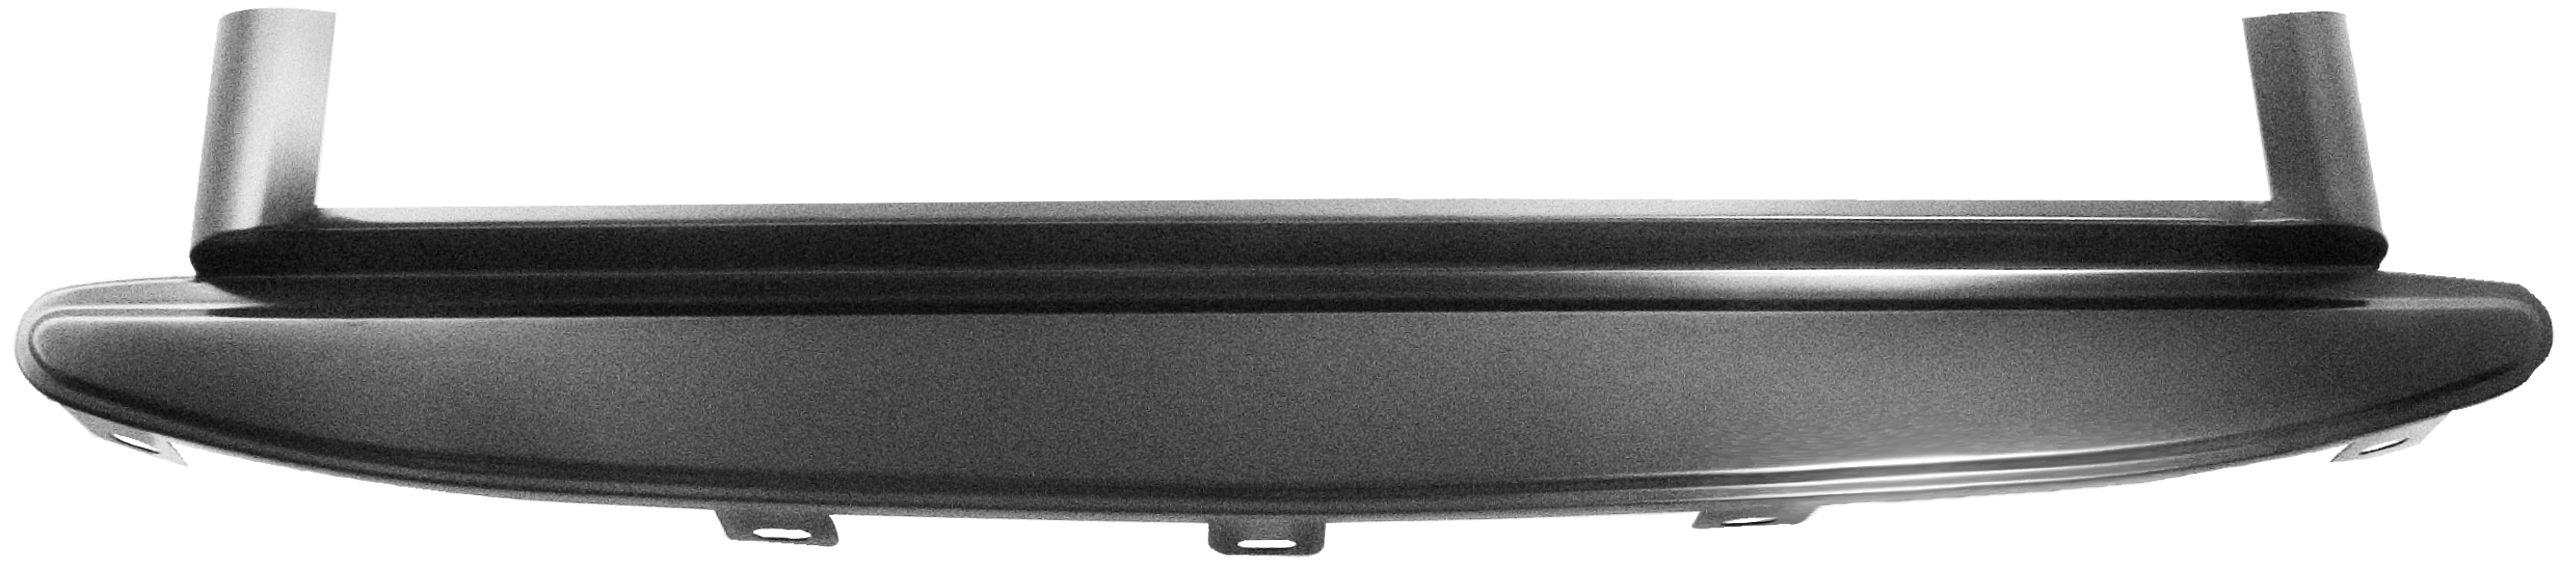 1947-54 C10 rear gravel shield